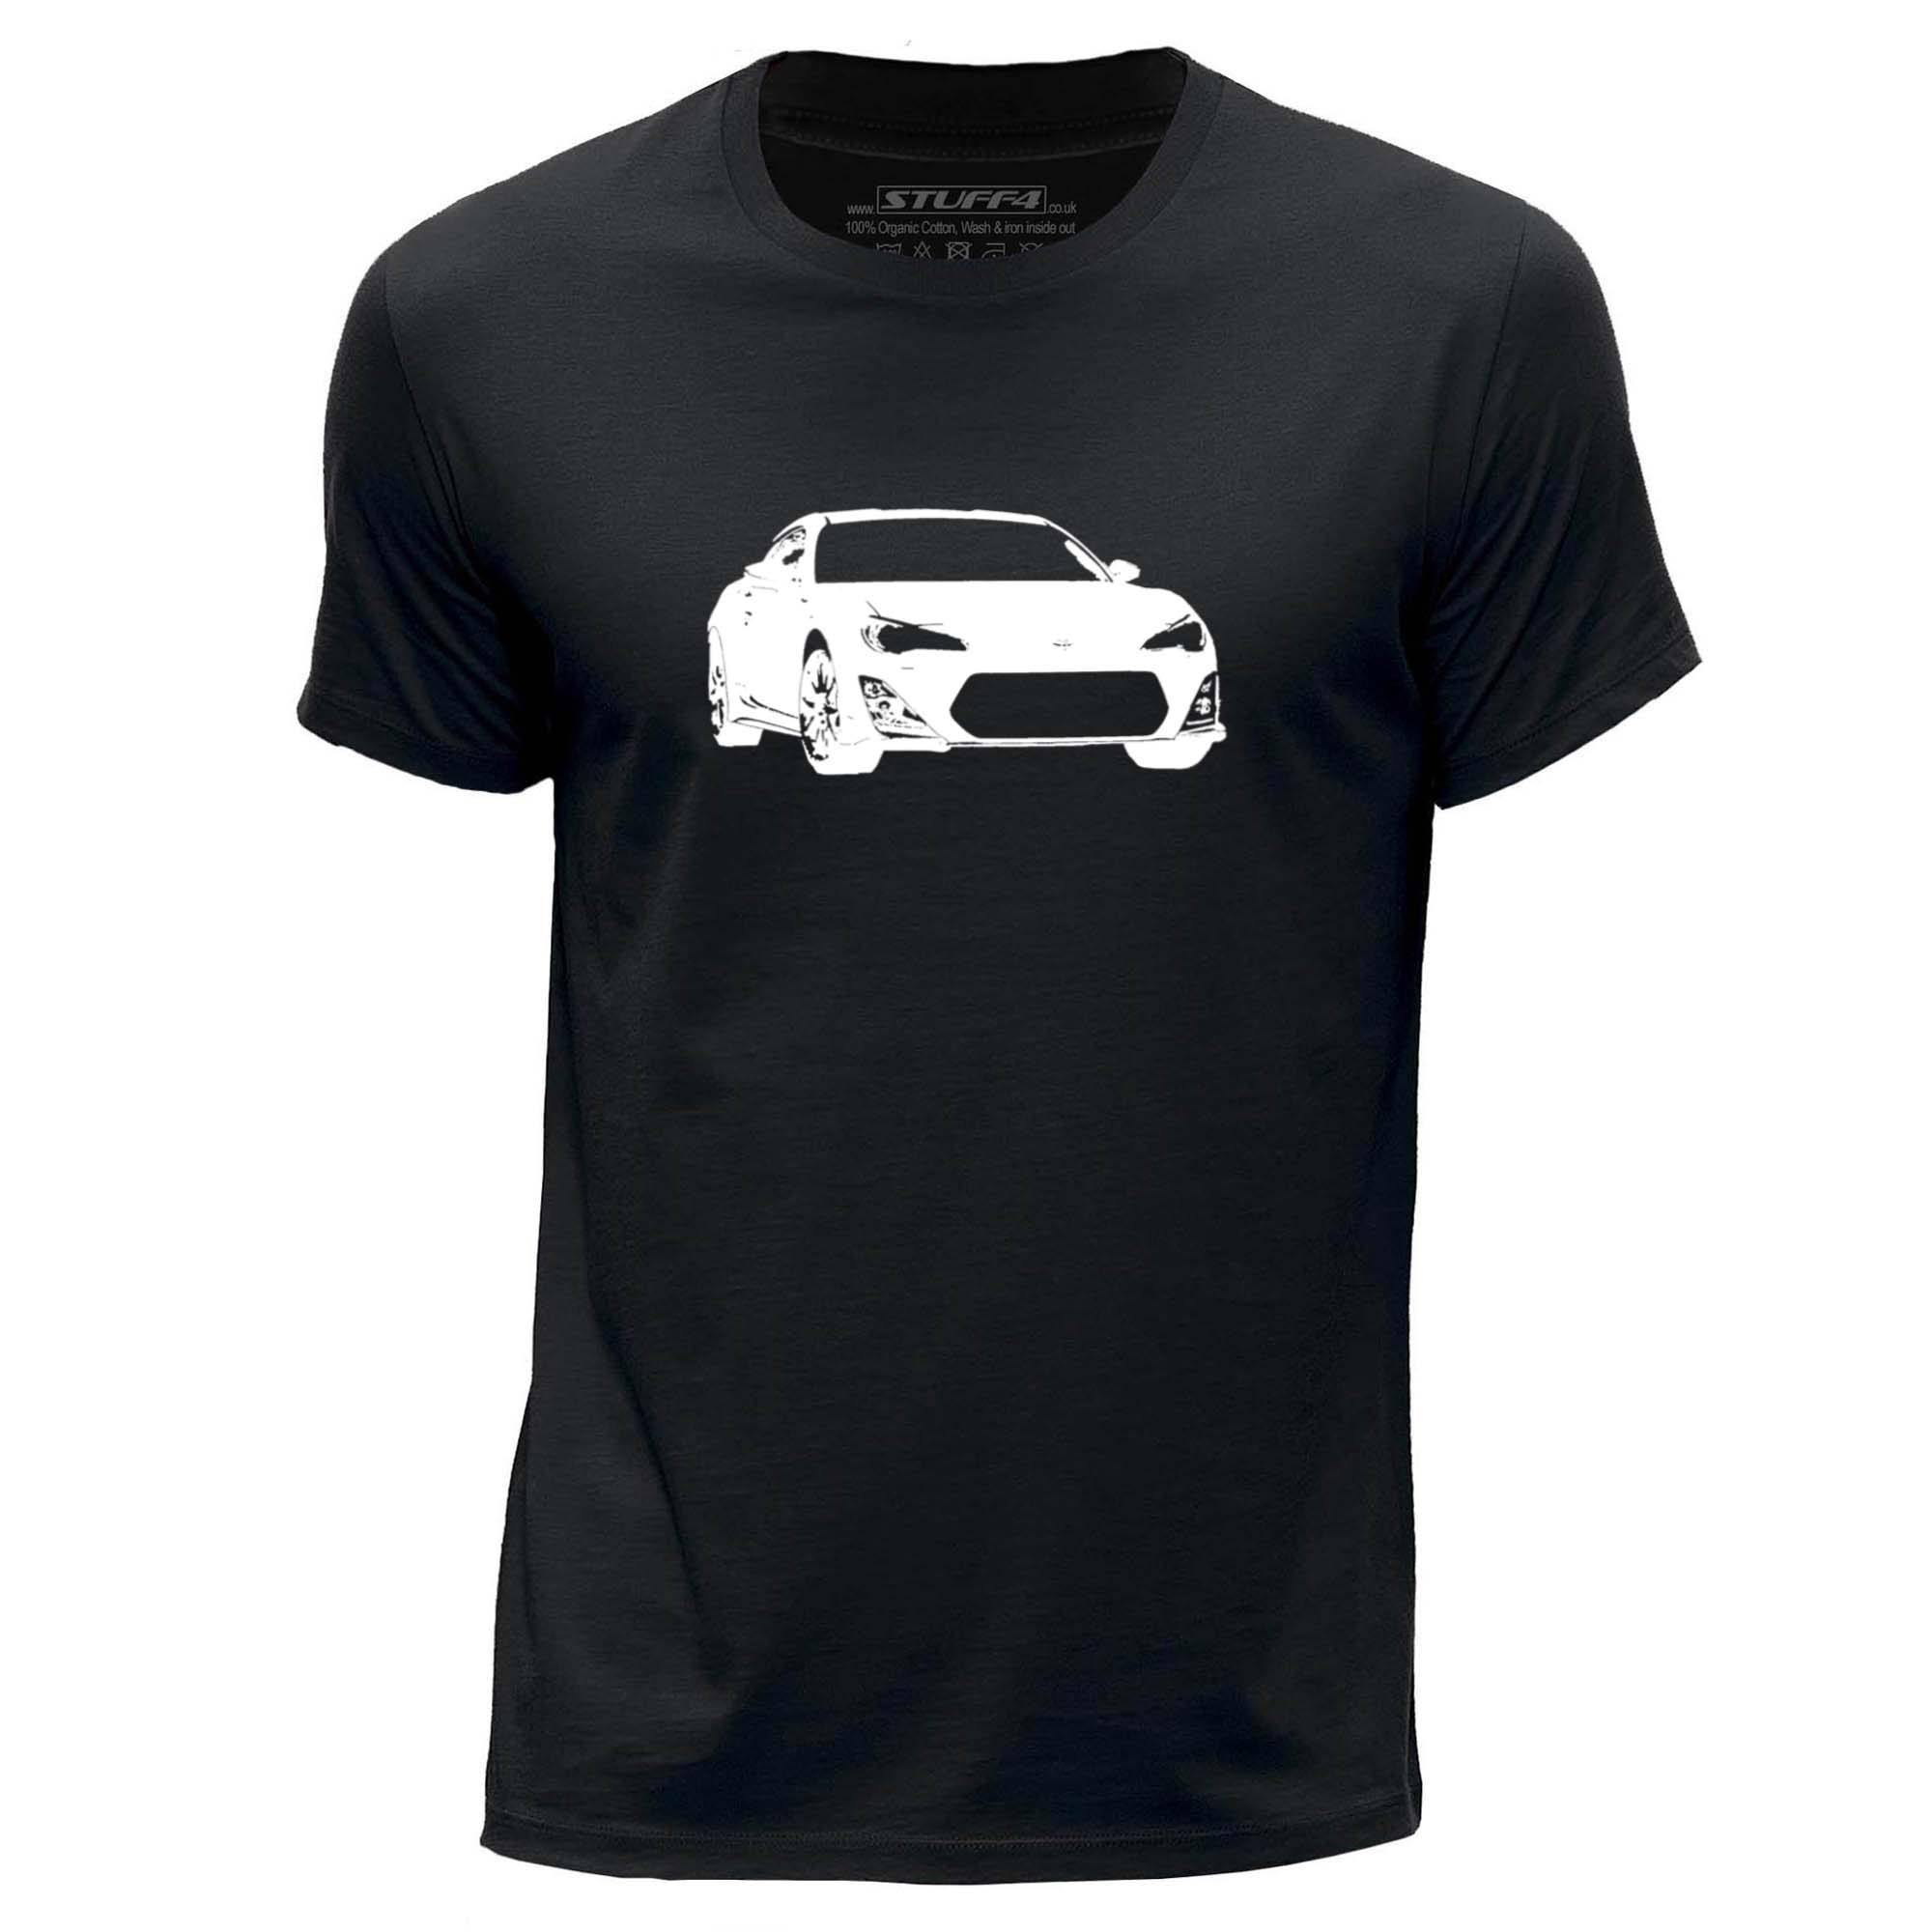 Gt86 design t shirts men s t shirt - Stuff4 Men 039 S Black Round Neck T